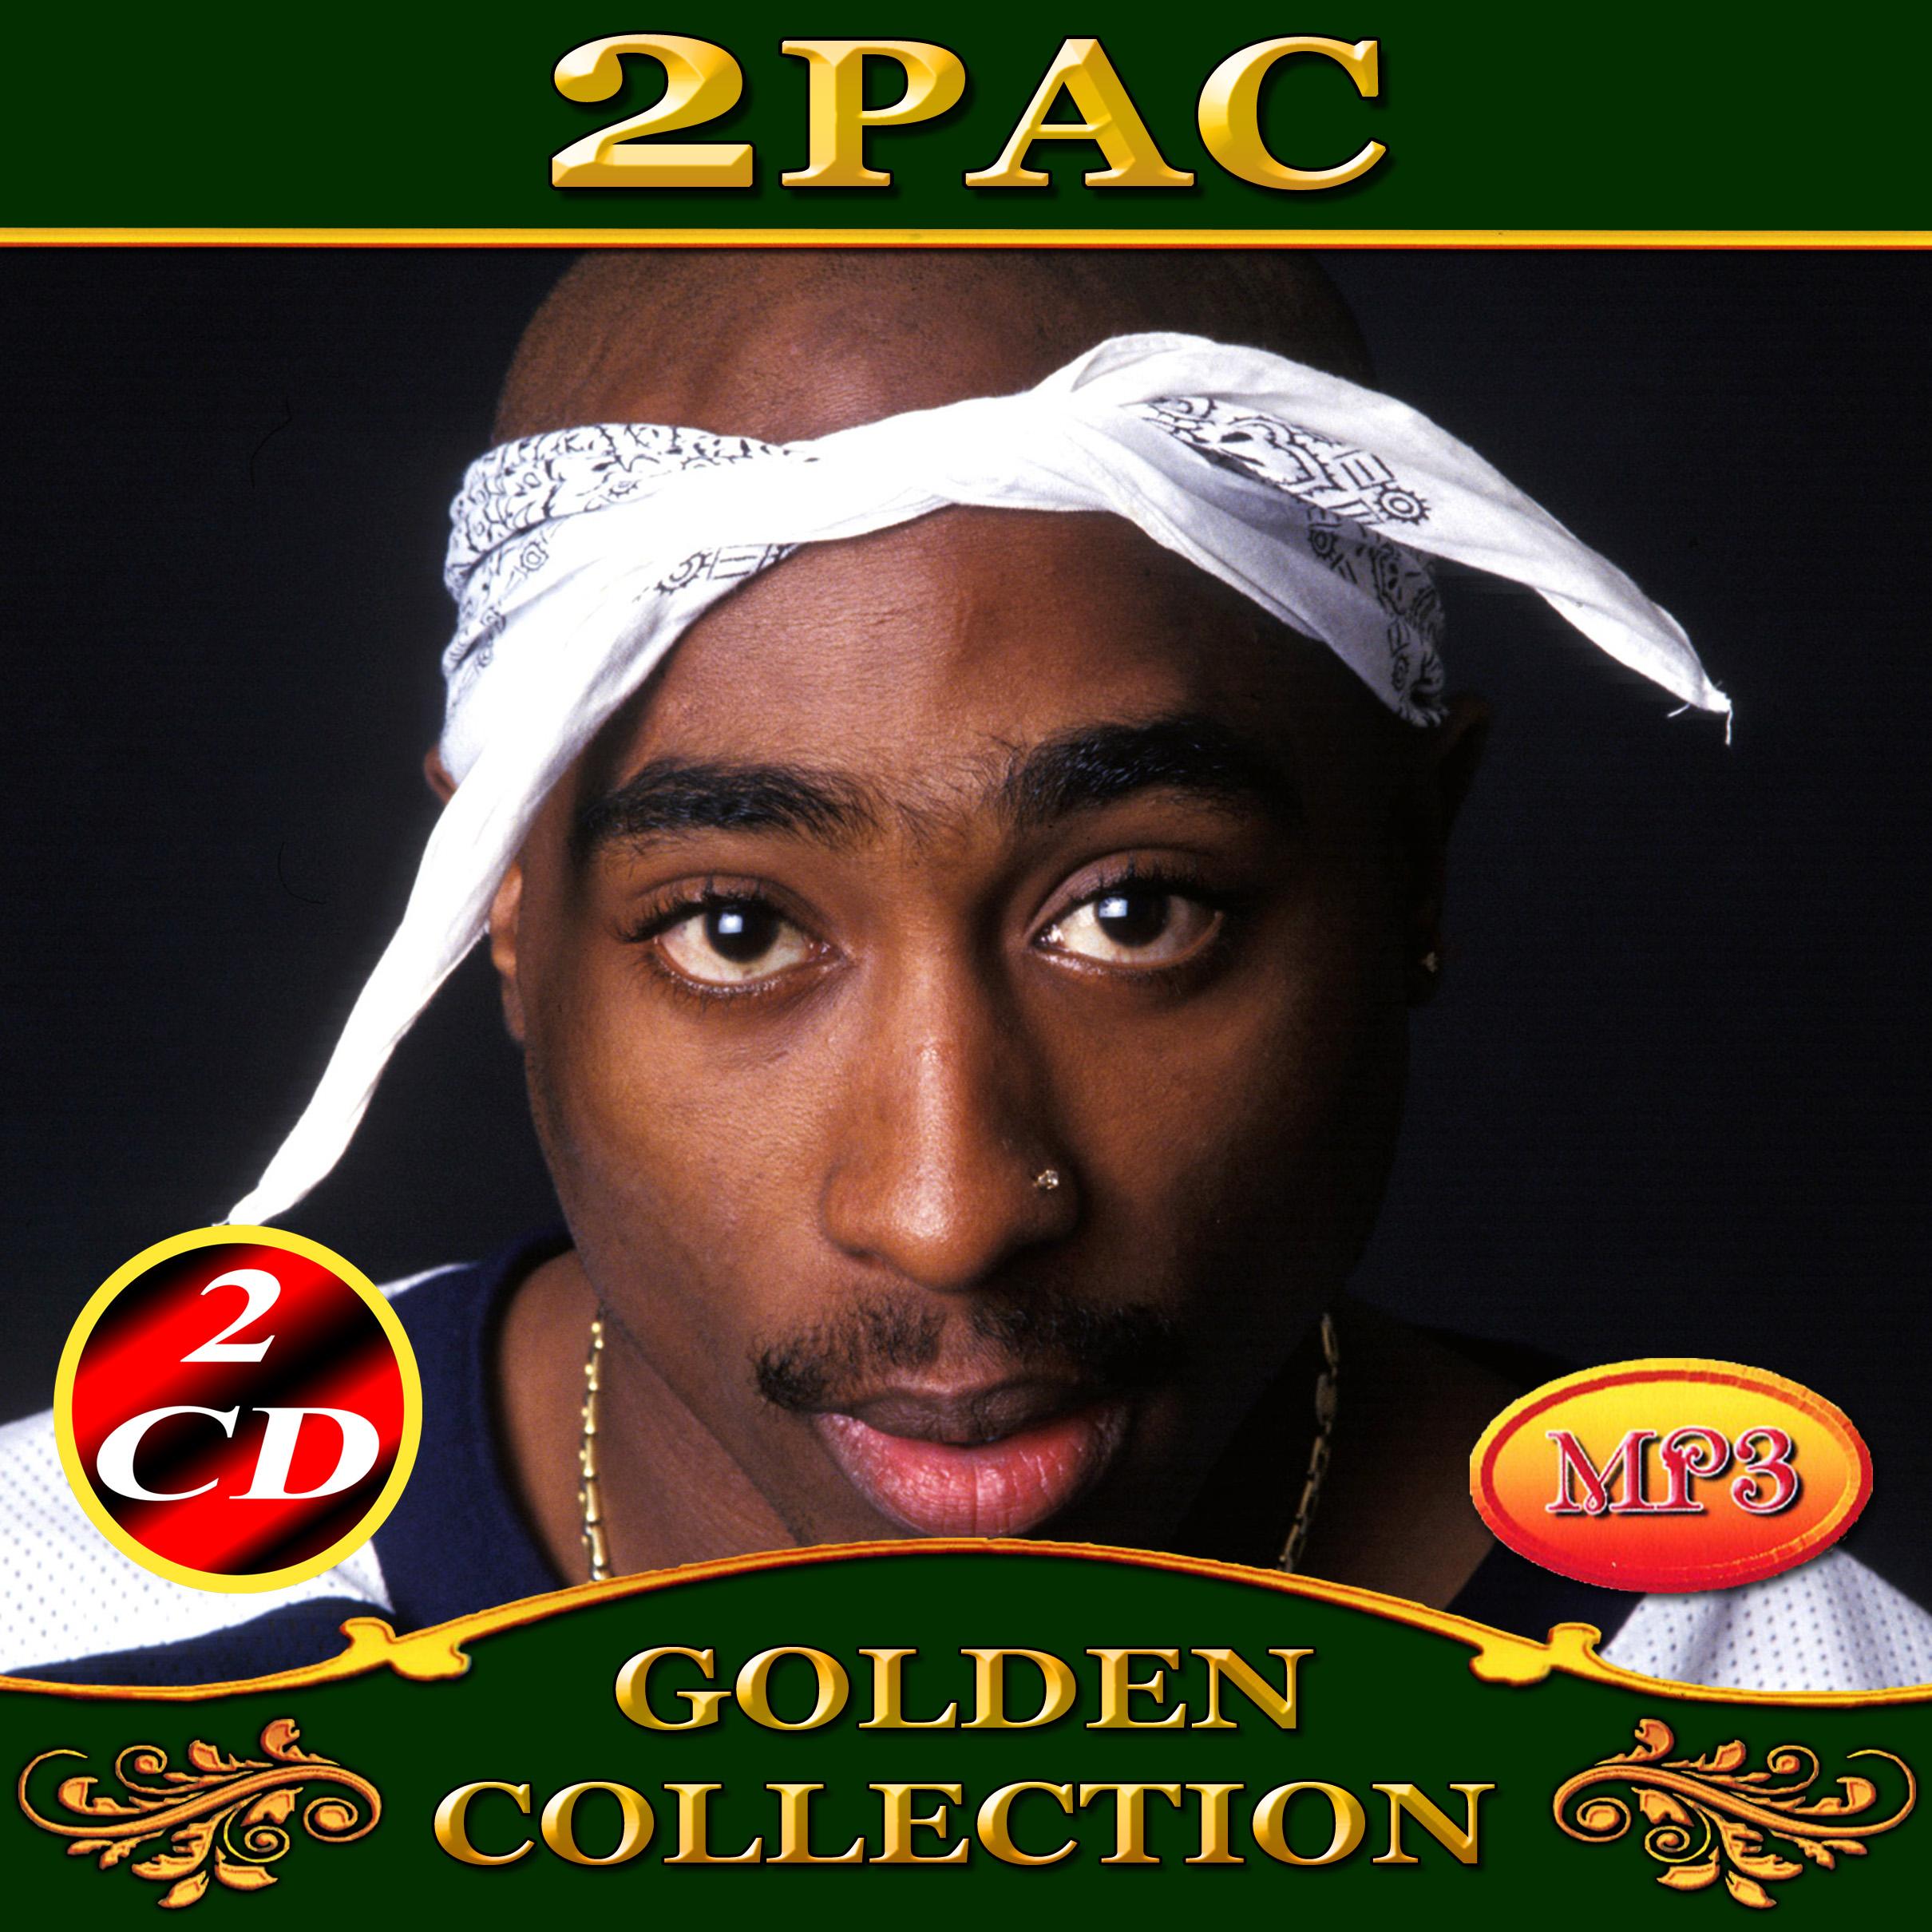 2PAC 2cd [mp3]